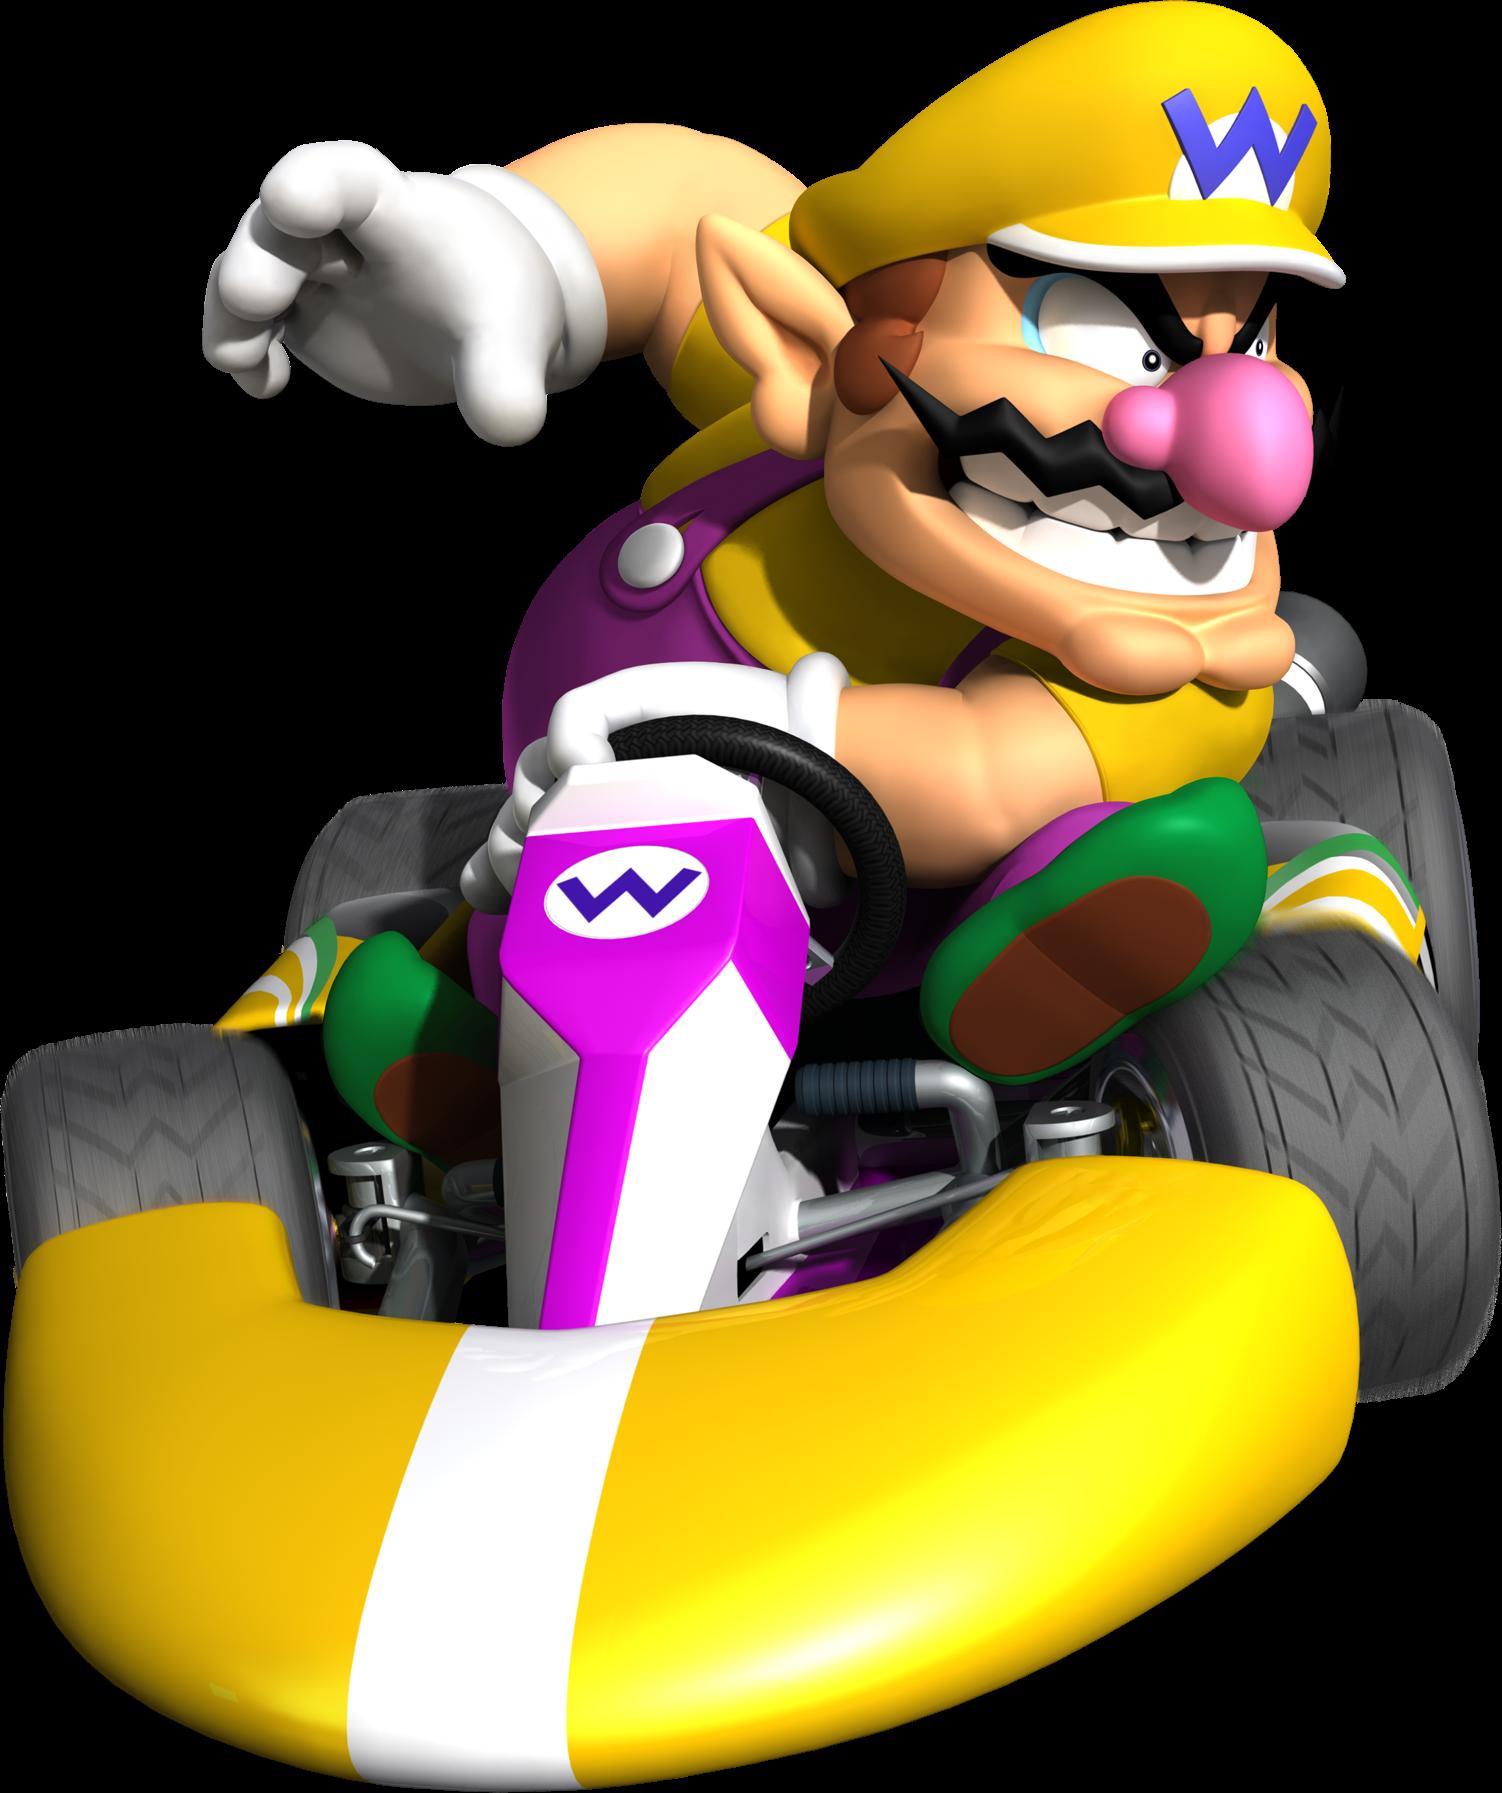 Mario Kart Wii Mario Kart Racing Wiki Fandom